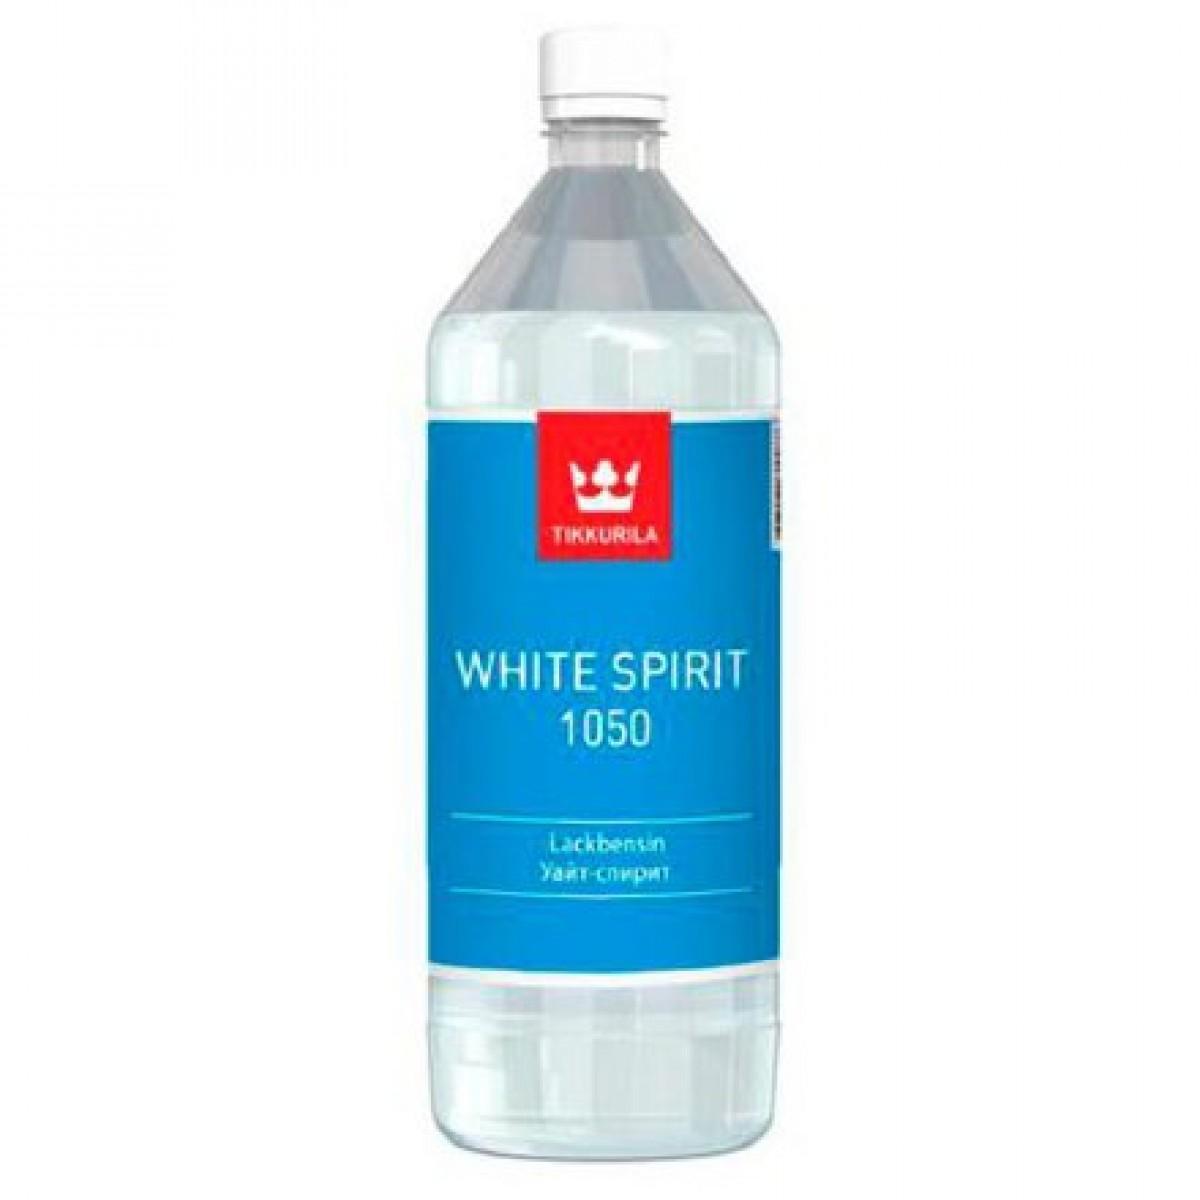 Растворитель Tikkurila White-spirit 1050 10 л